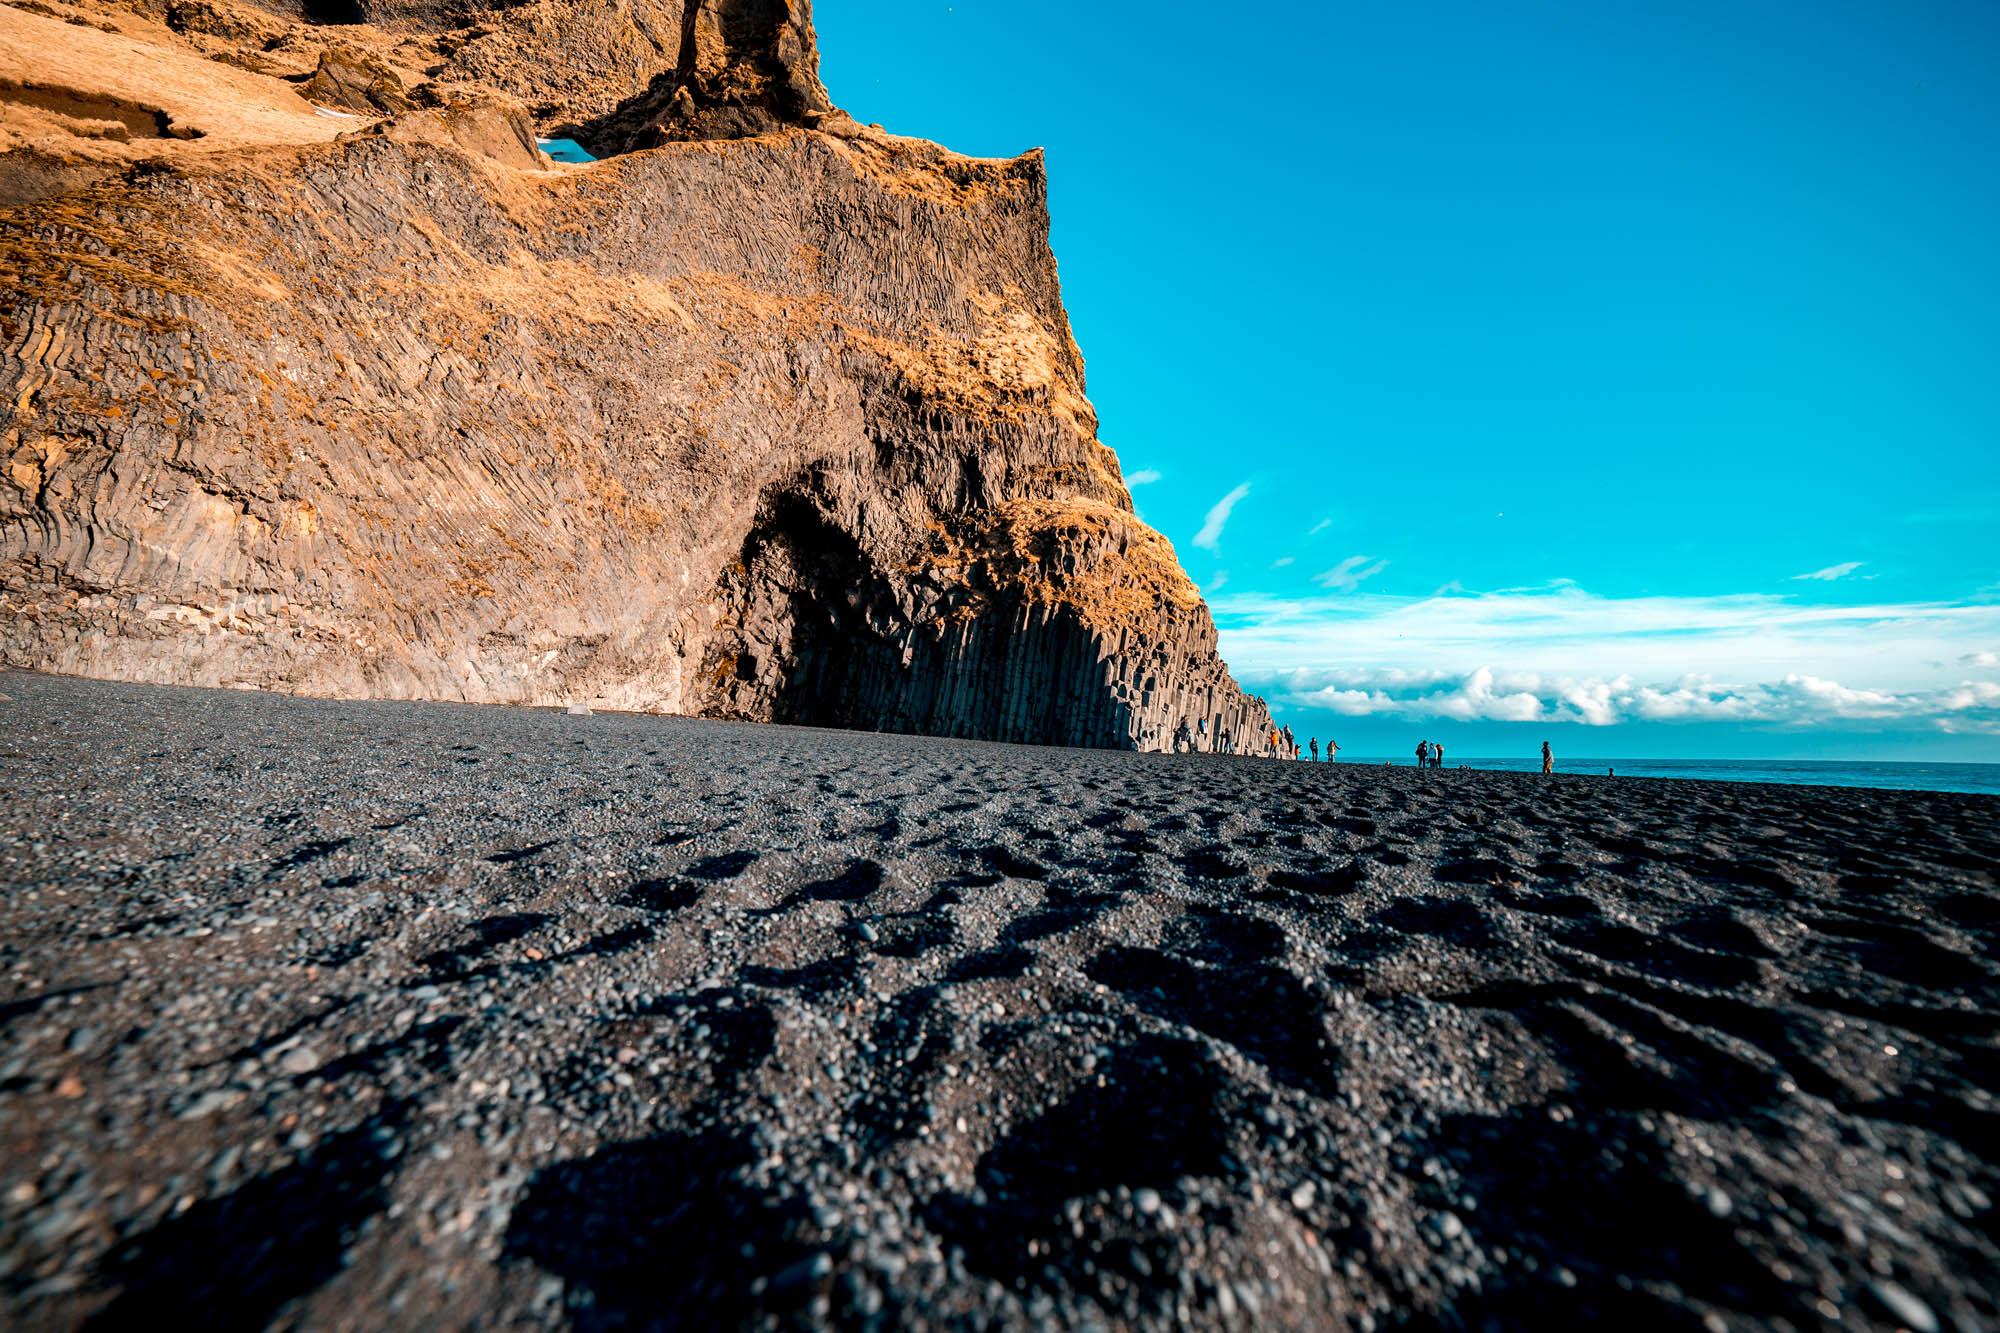 reynisfjara-black-beach - south iceland tour